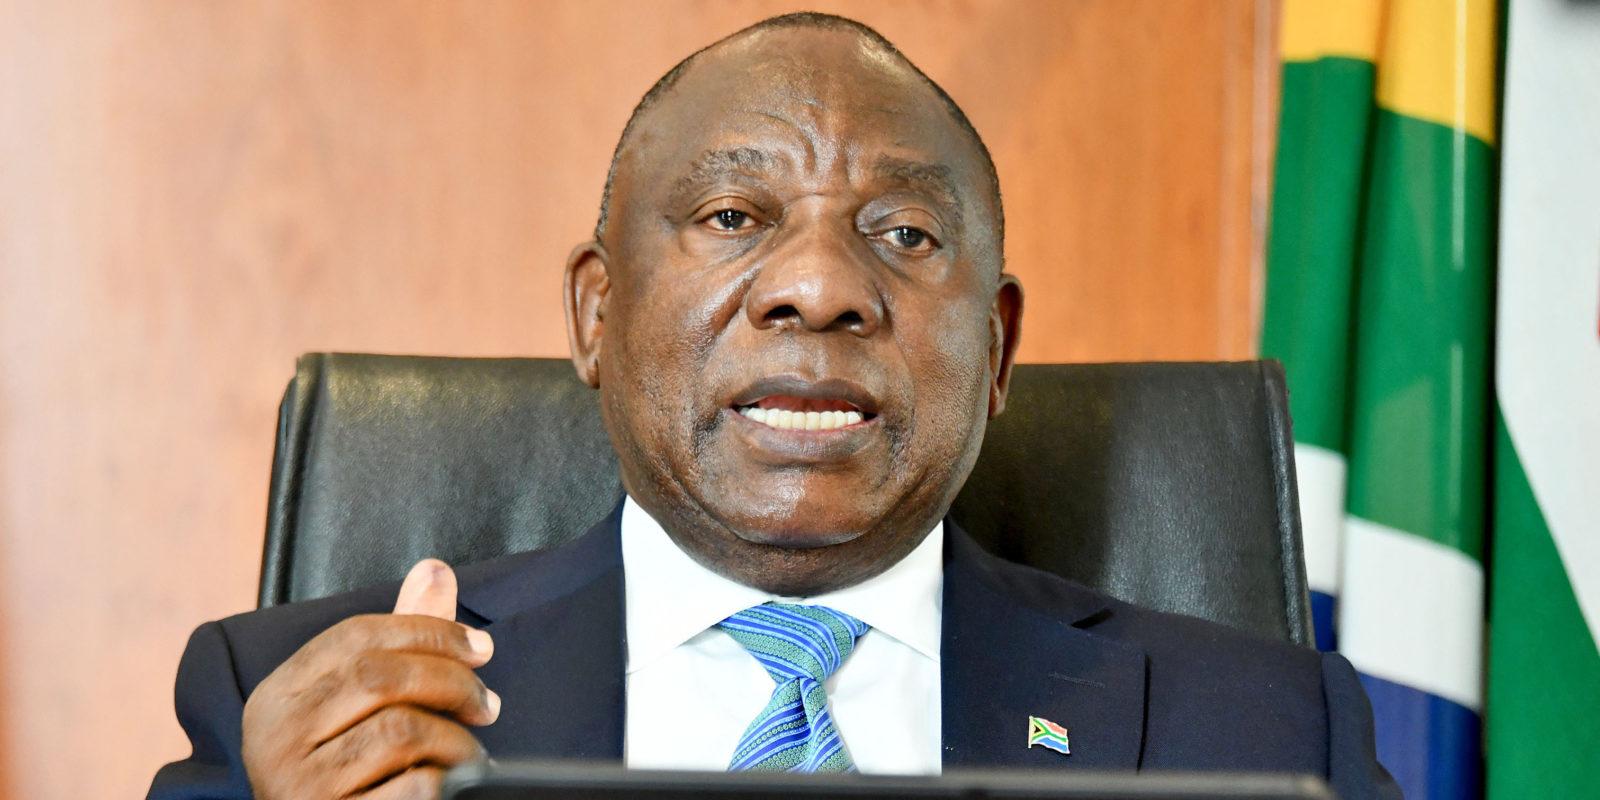 President Cyril Ramaphosa in Covid-19 self-quarantine